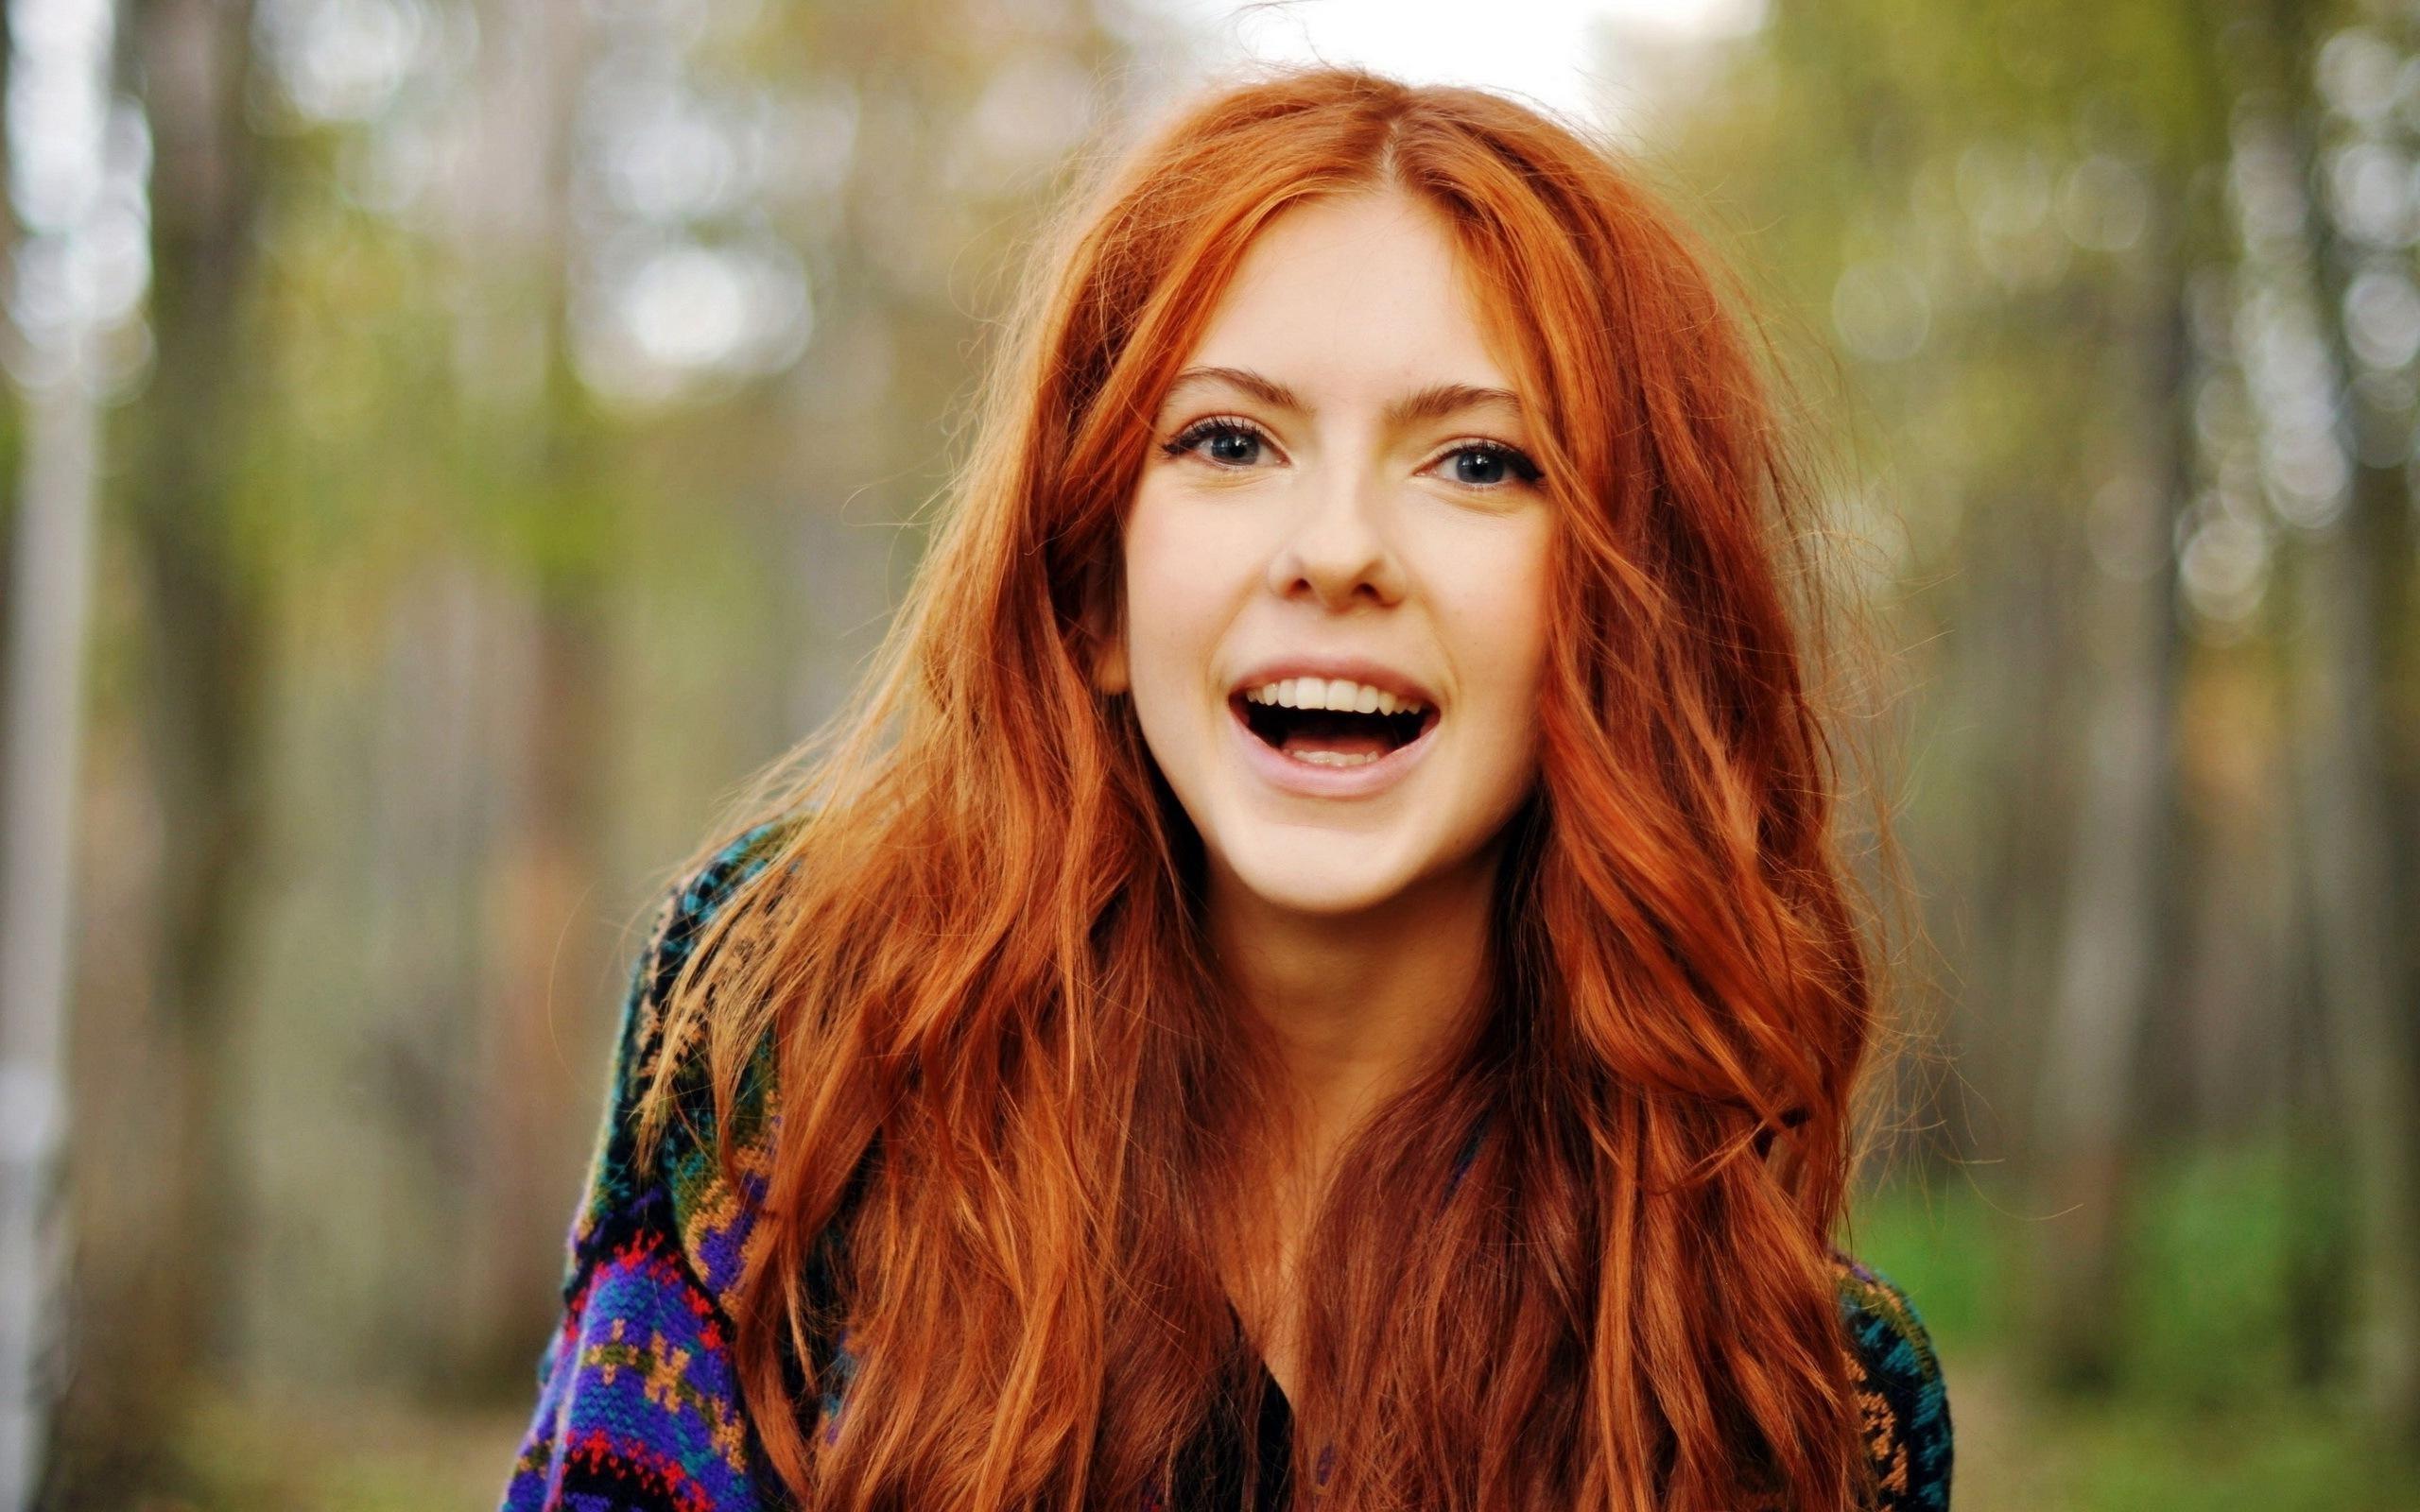 super redhead girl wallpaper